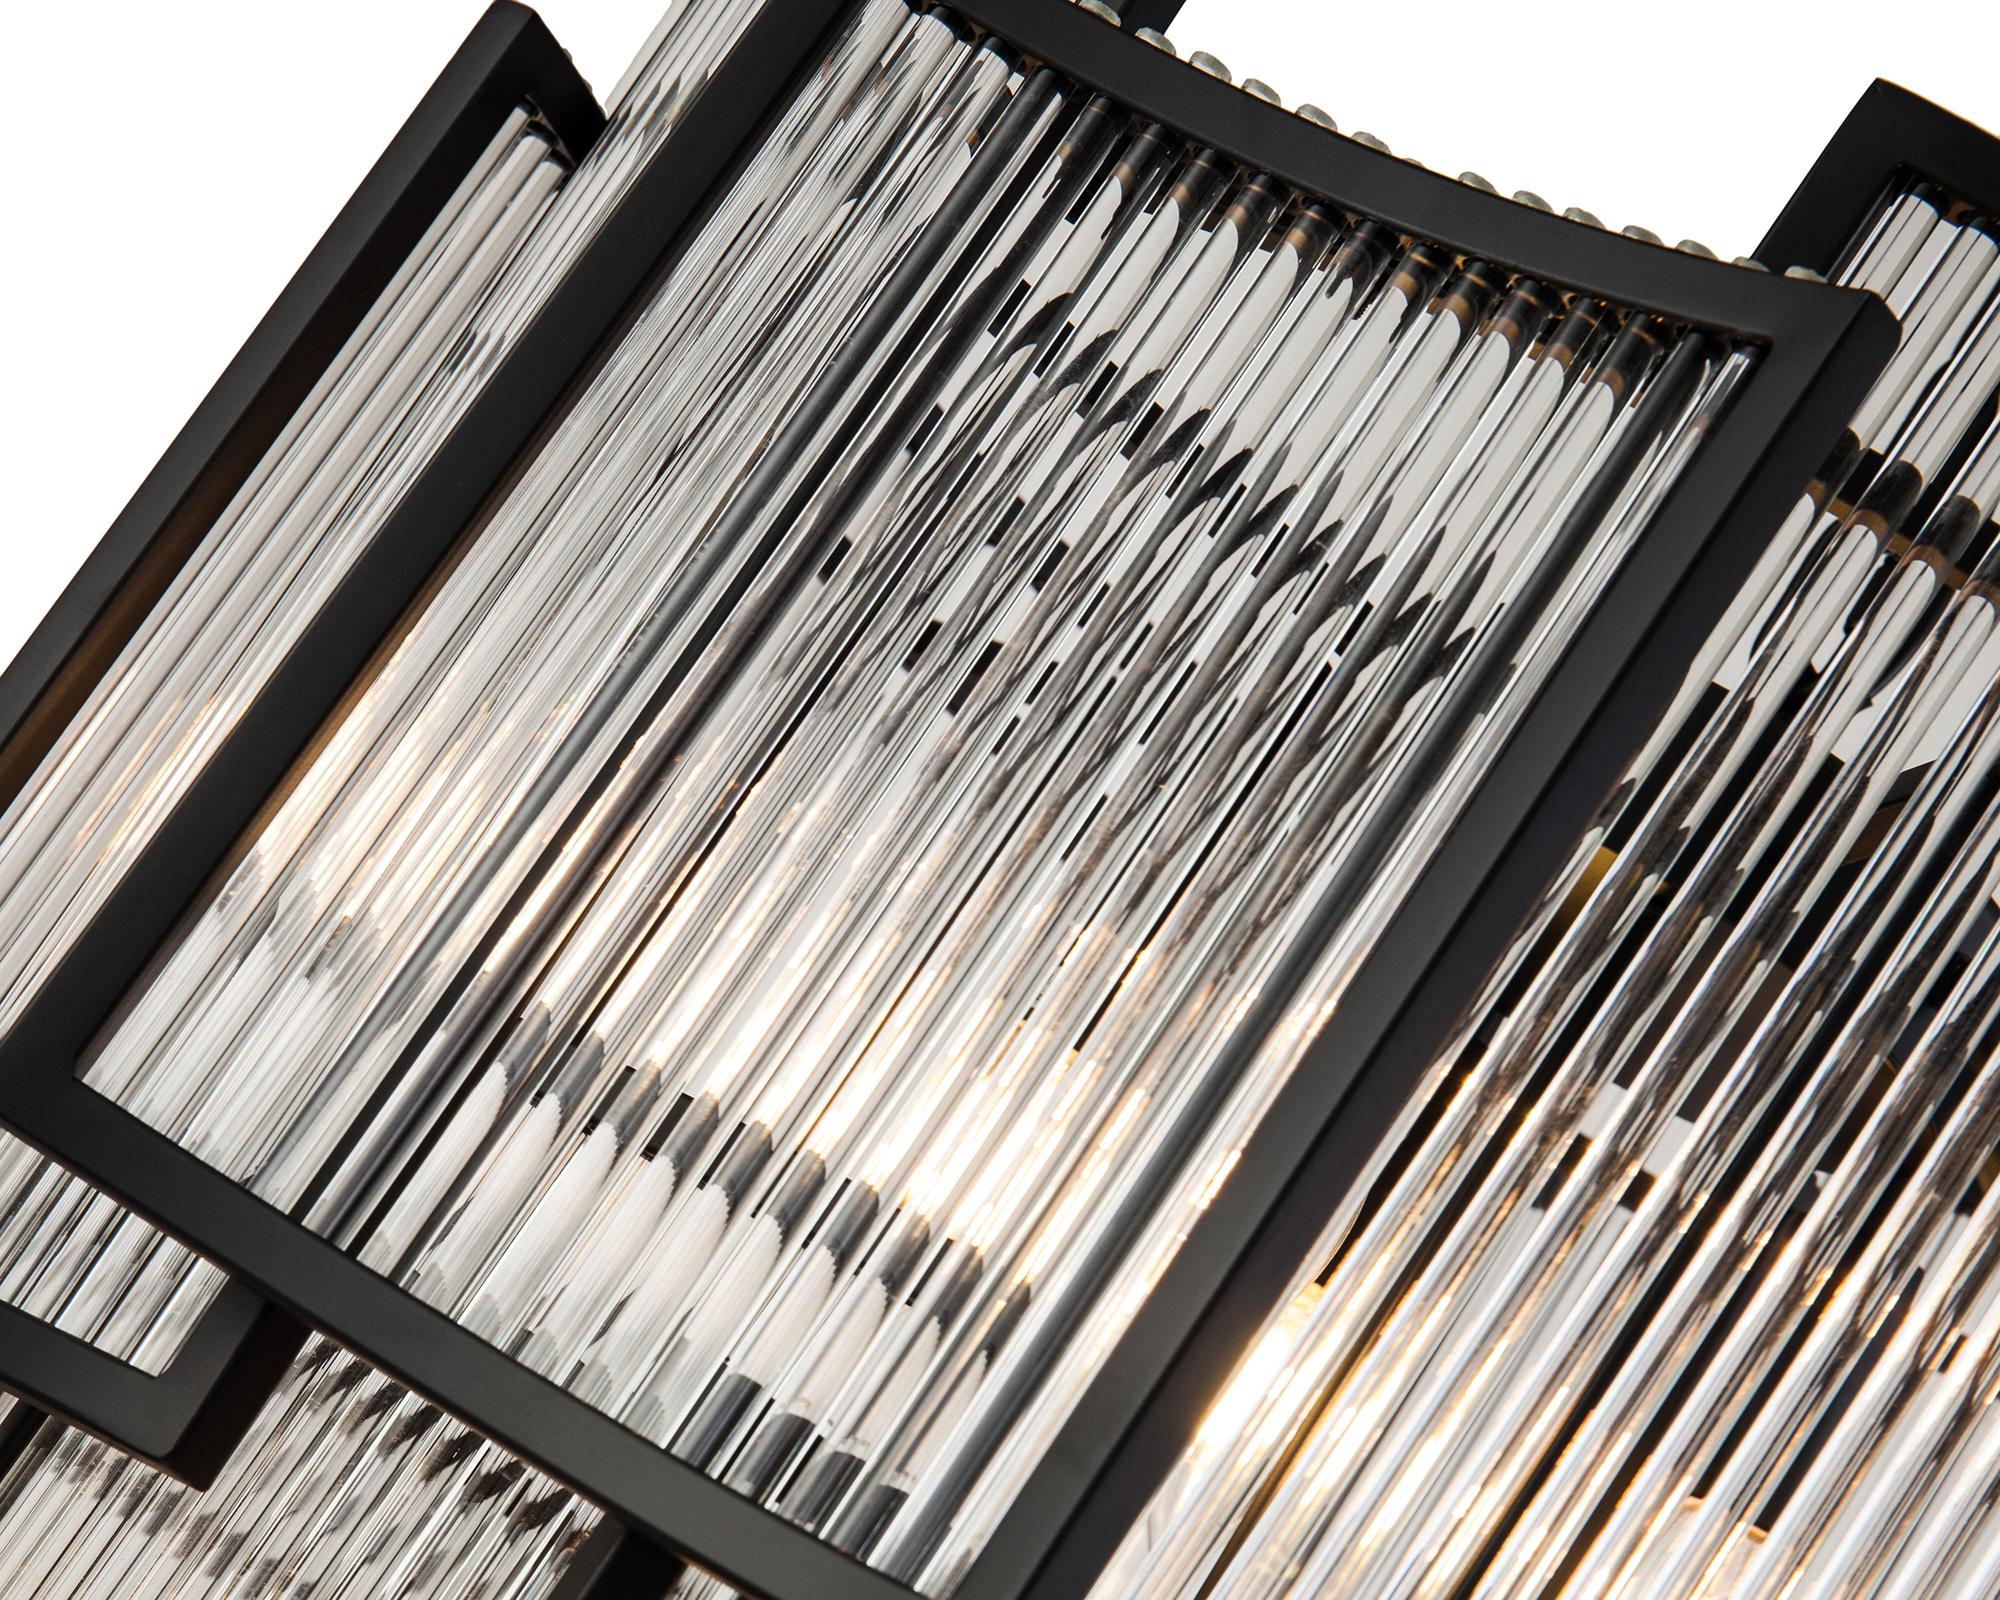 Liang & Eimil SUM-LGT-0217 Paladium Pendant Light (4)